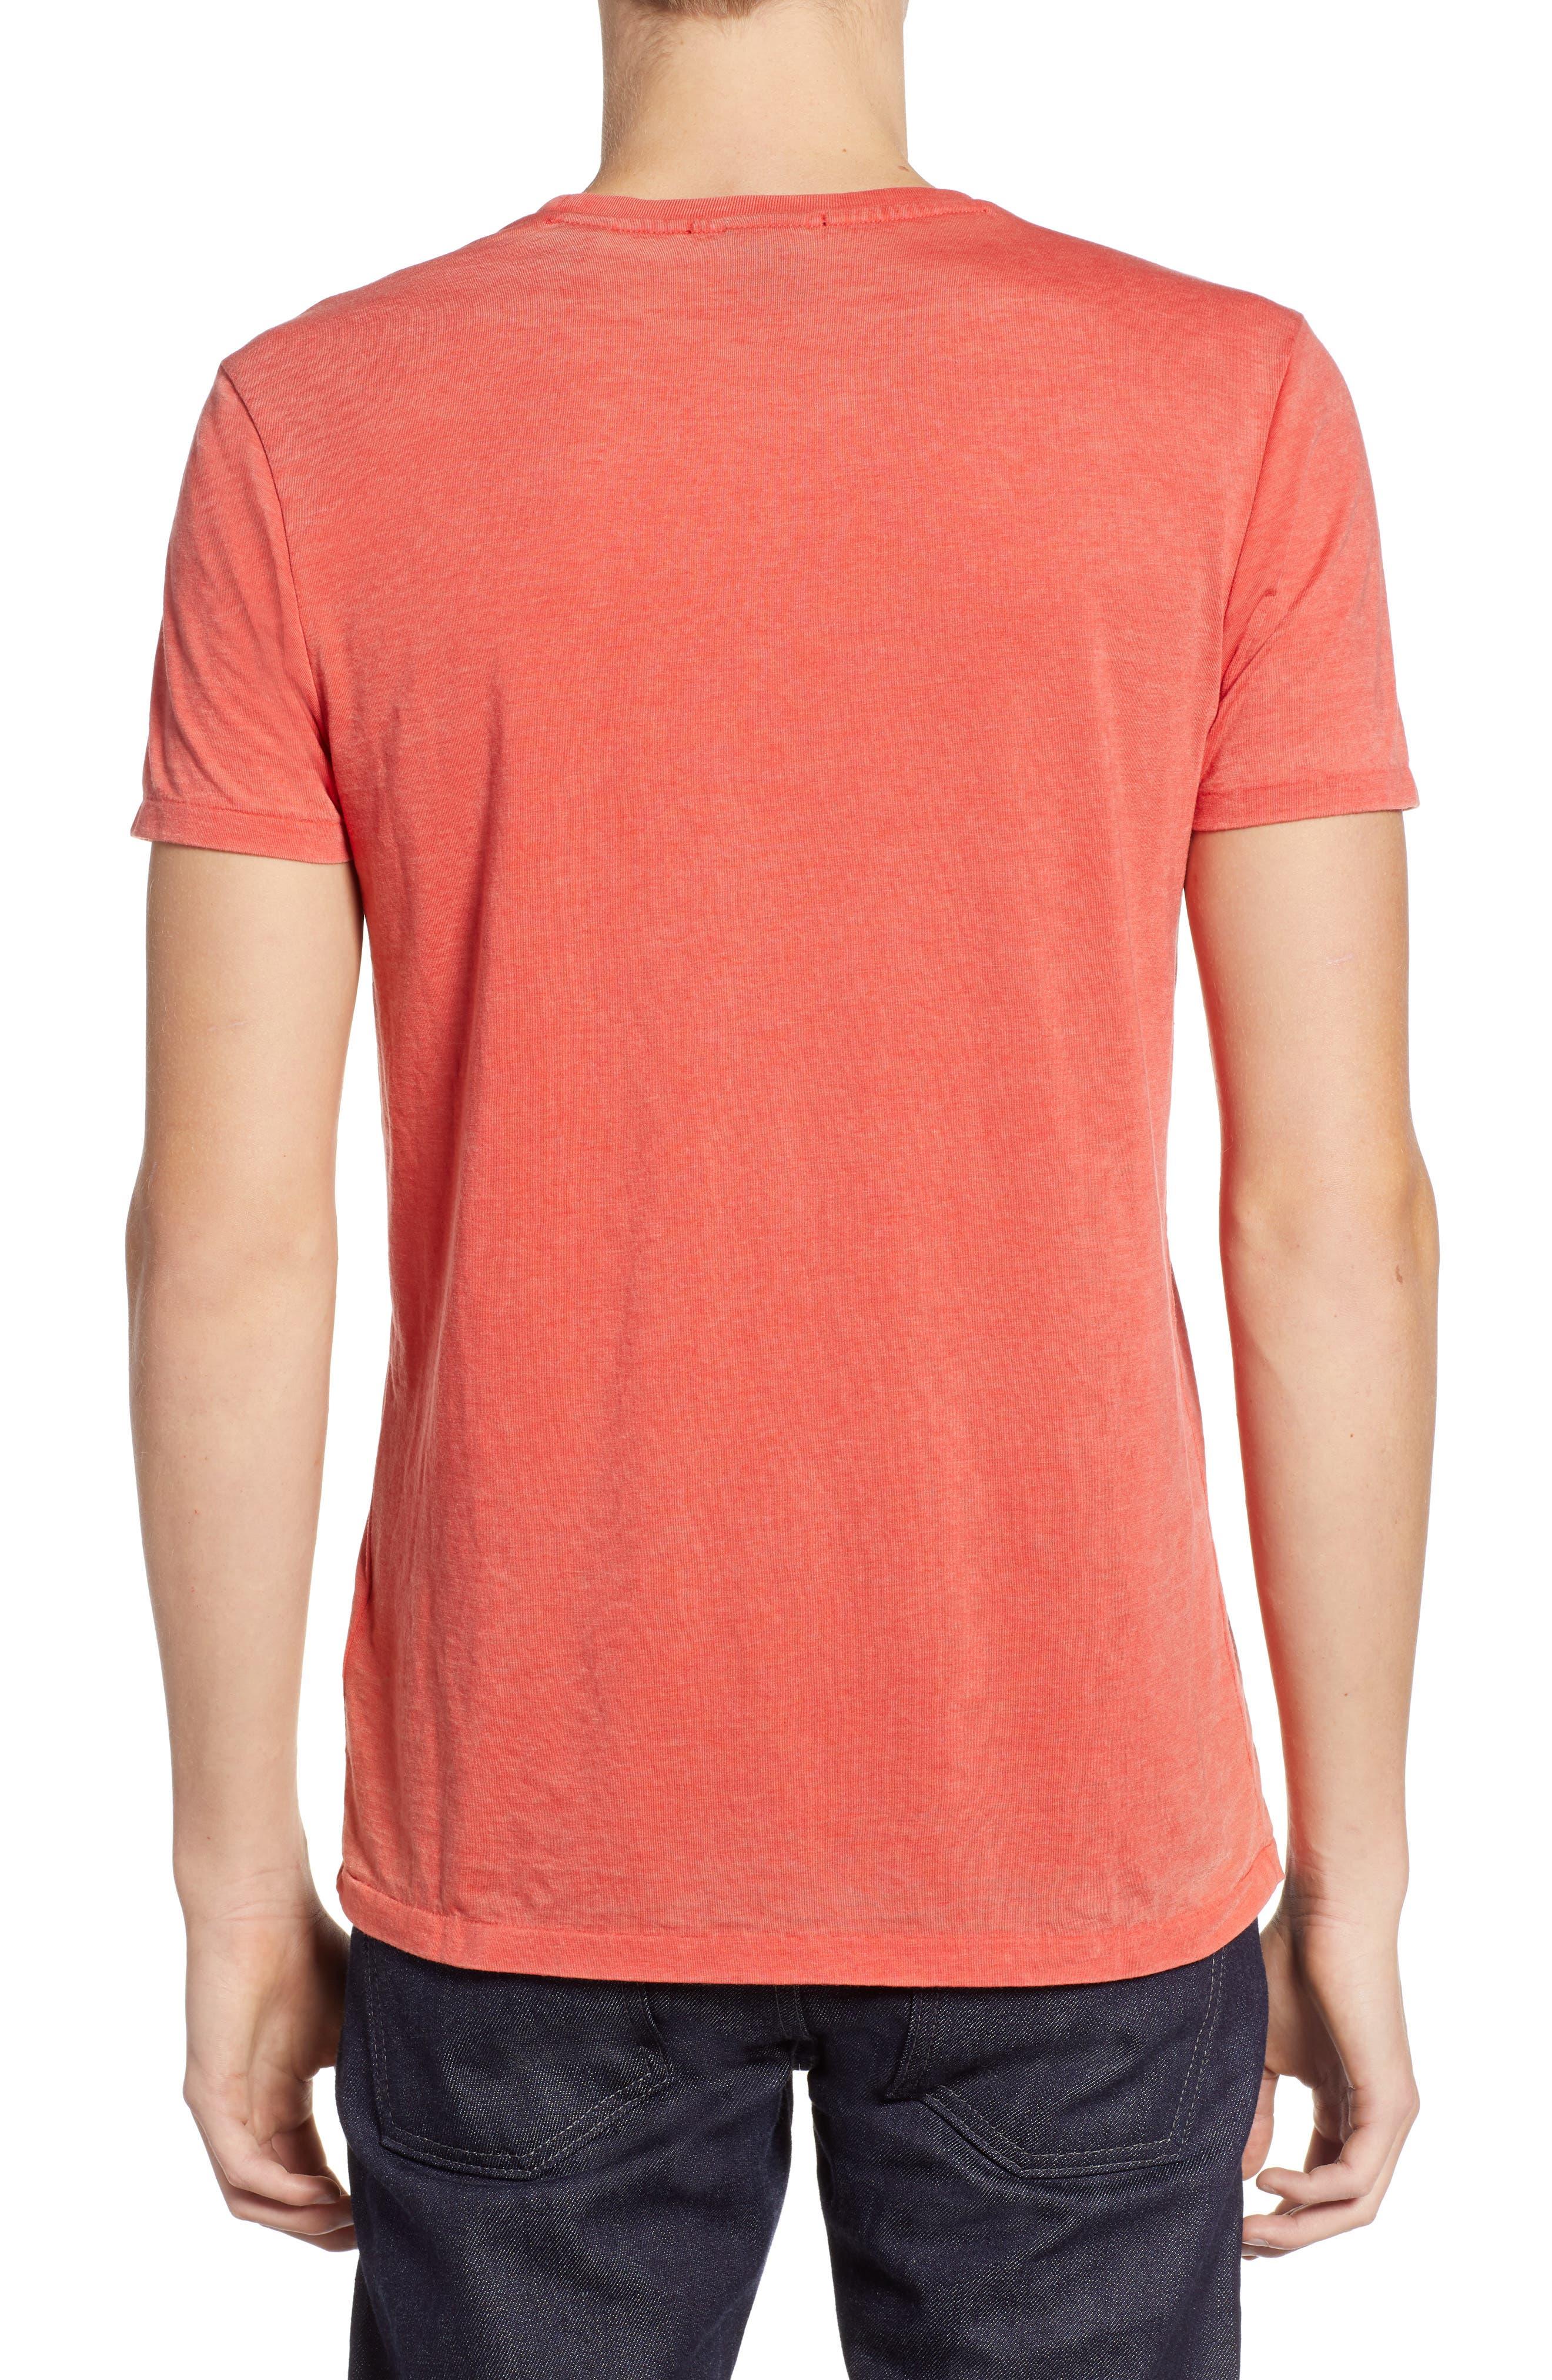 Burnout T-Shirt,                             Alternate thumbnail 2, color,                             RED MELANGE